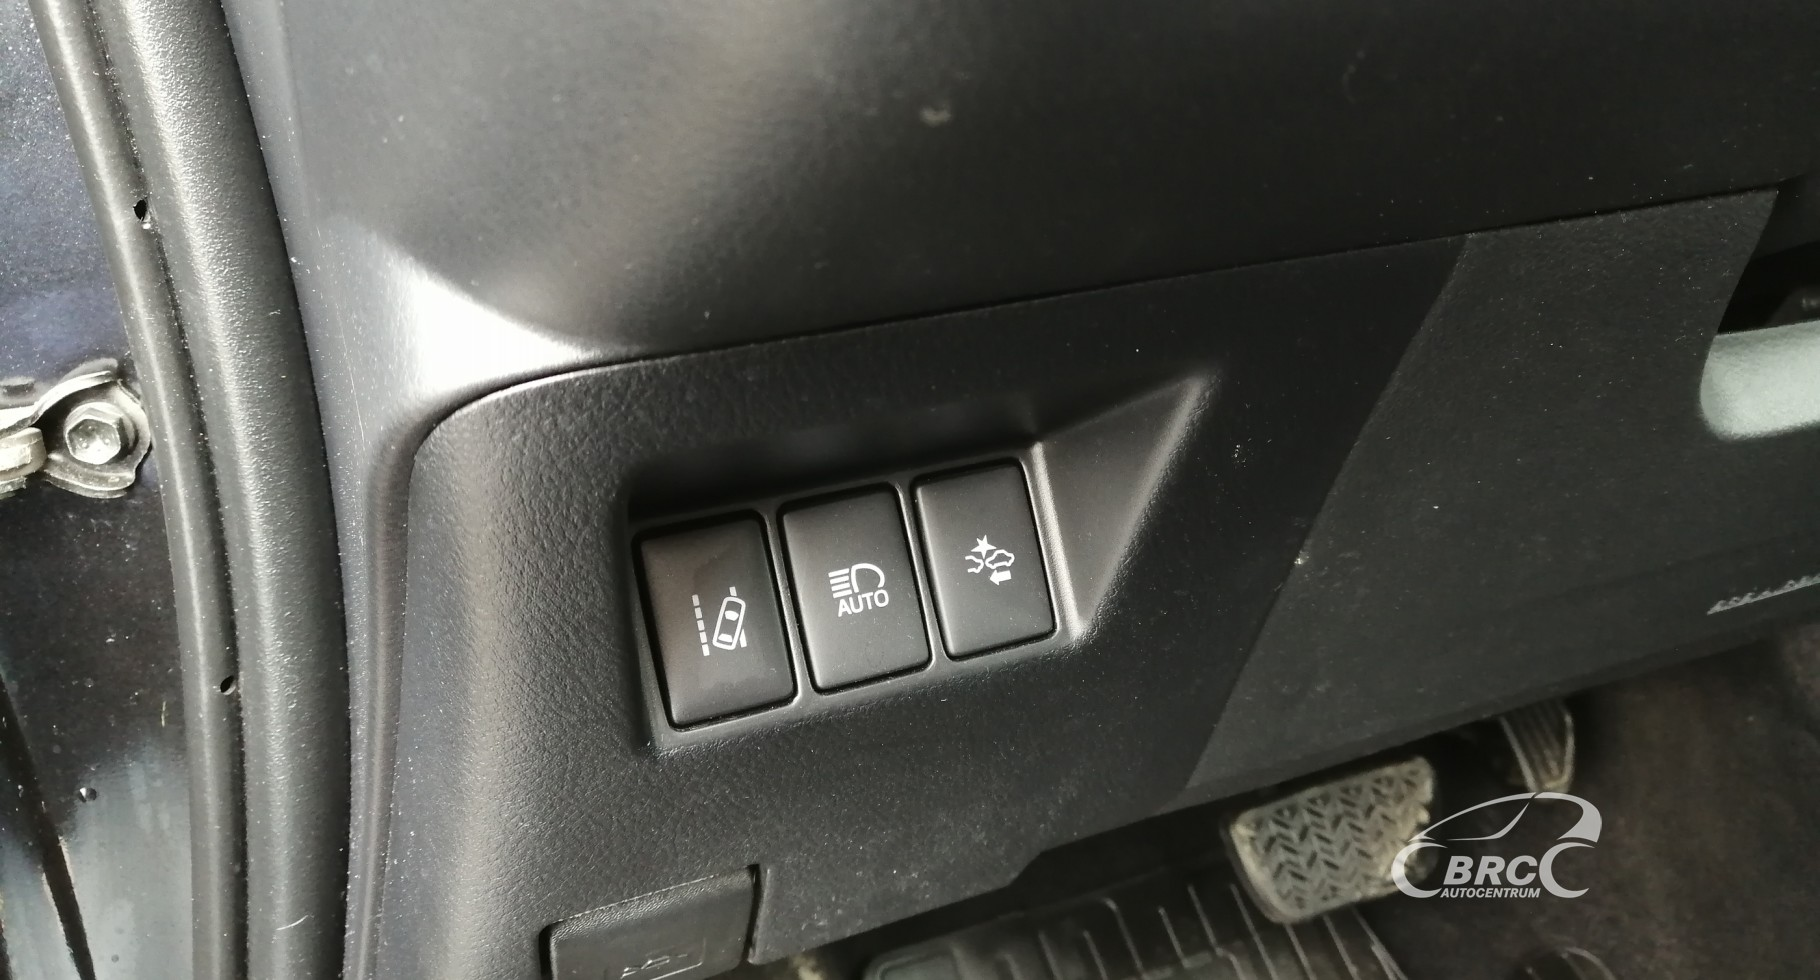 Toyota Yaris 1.5 VVT-i Hybrid Automatas